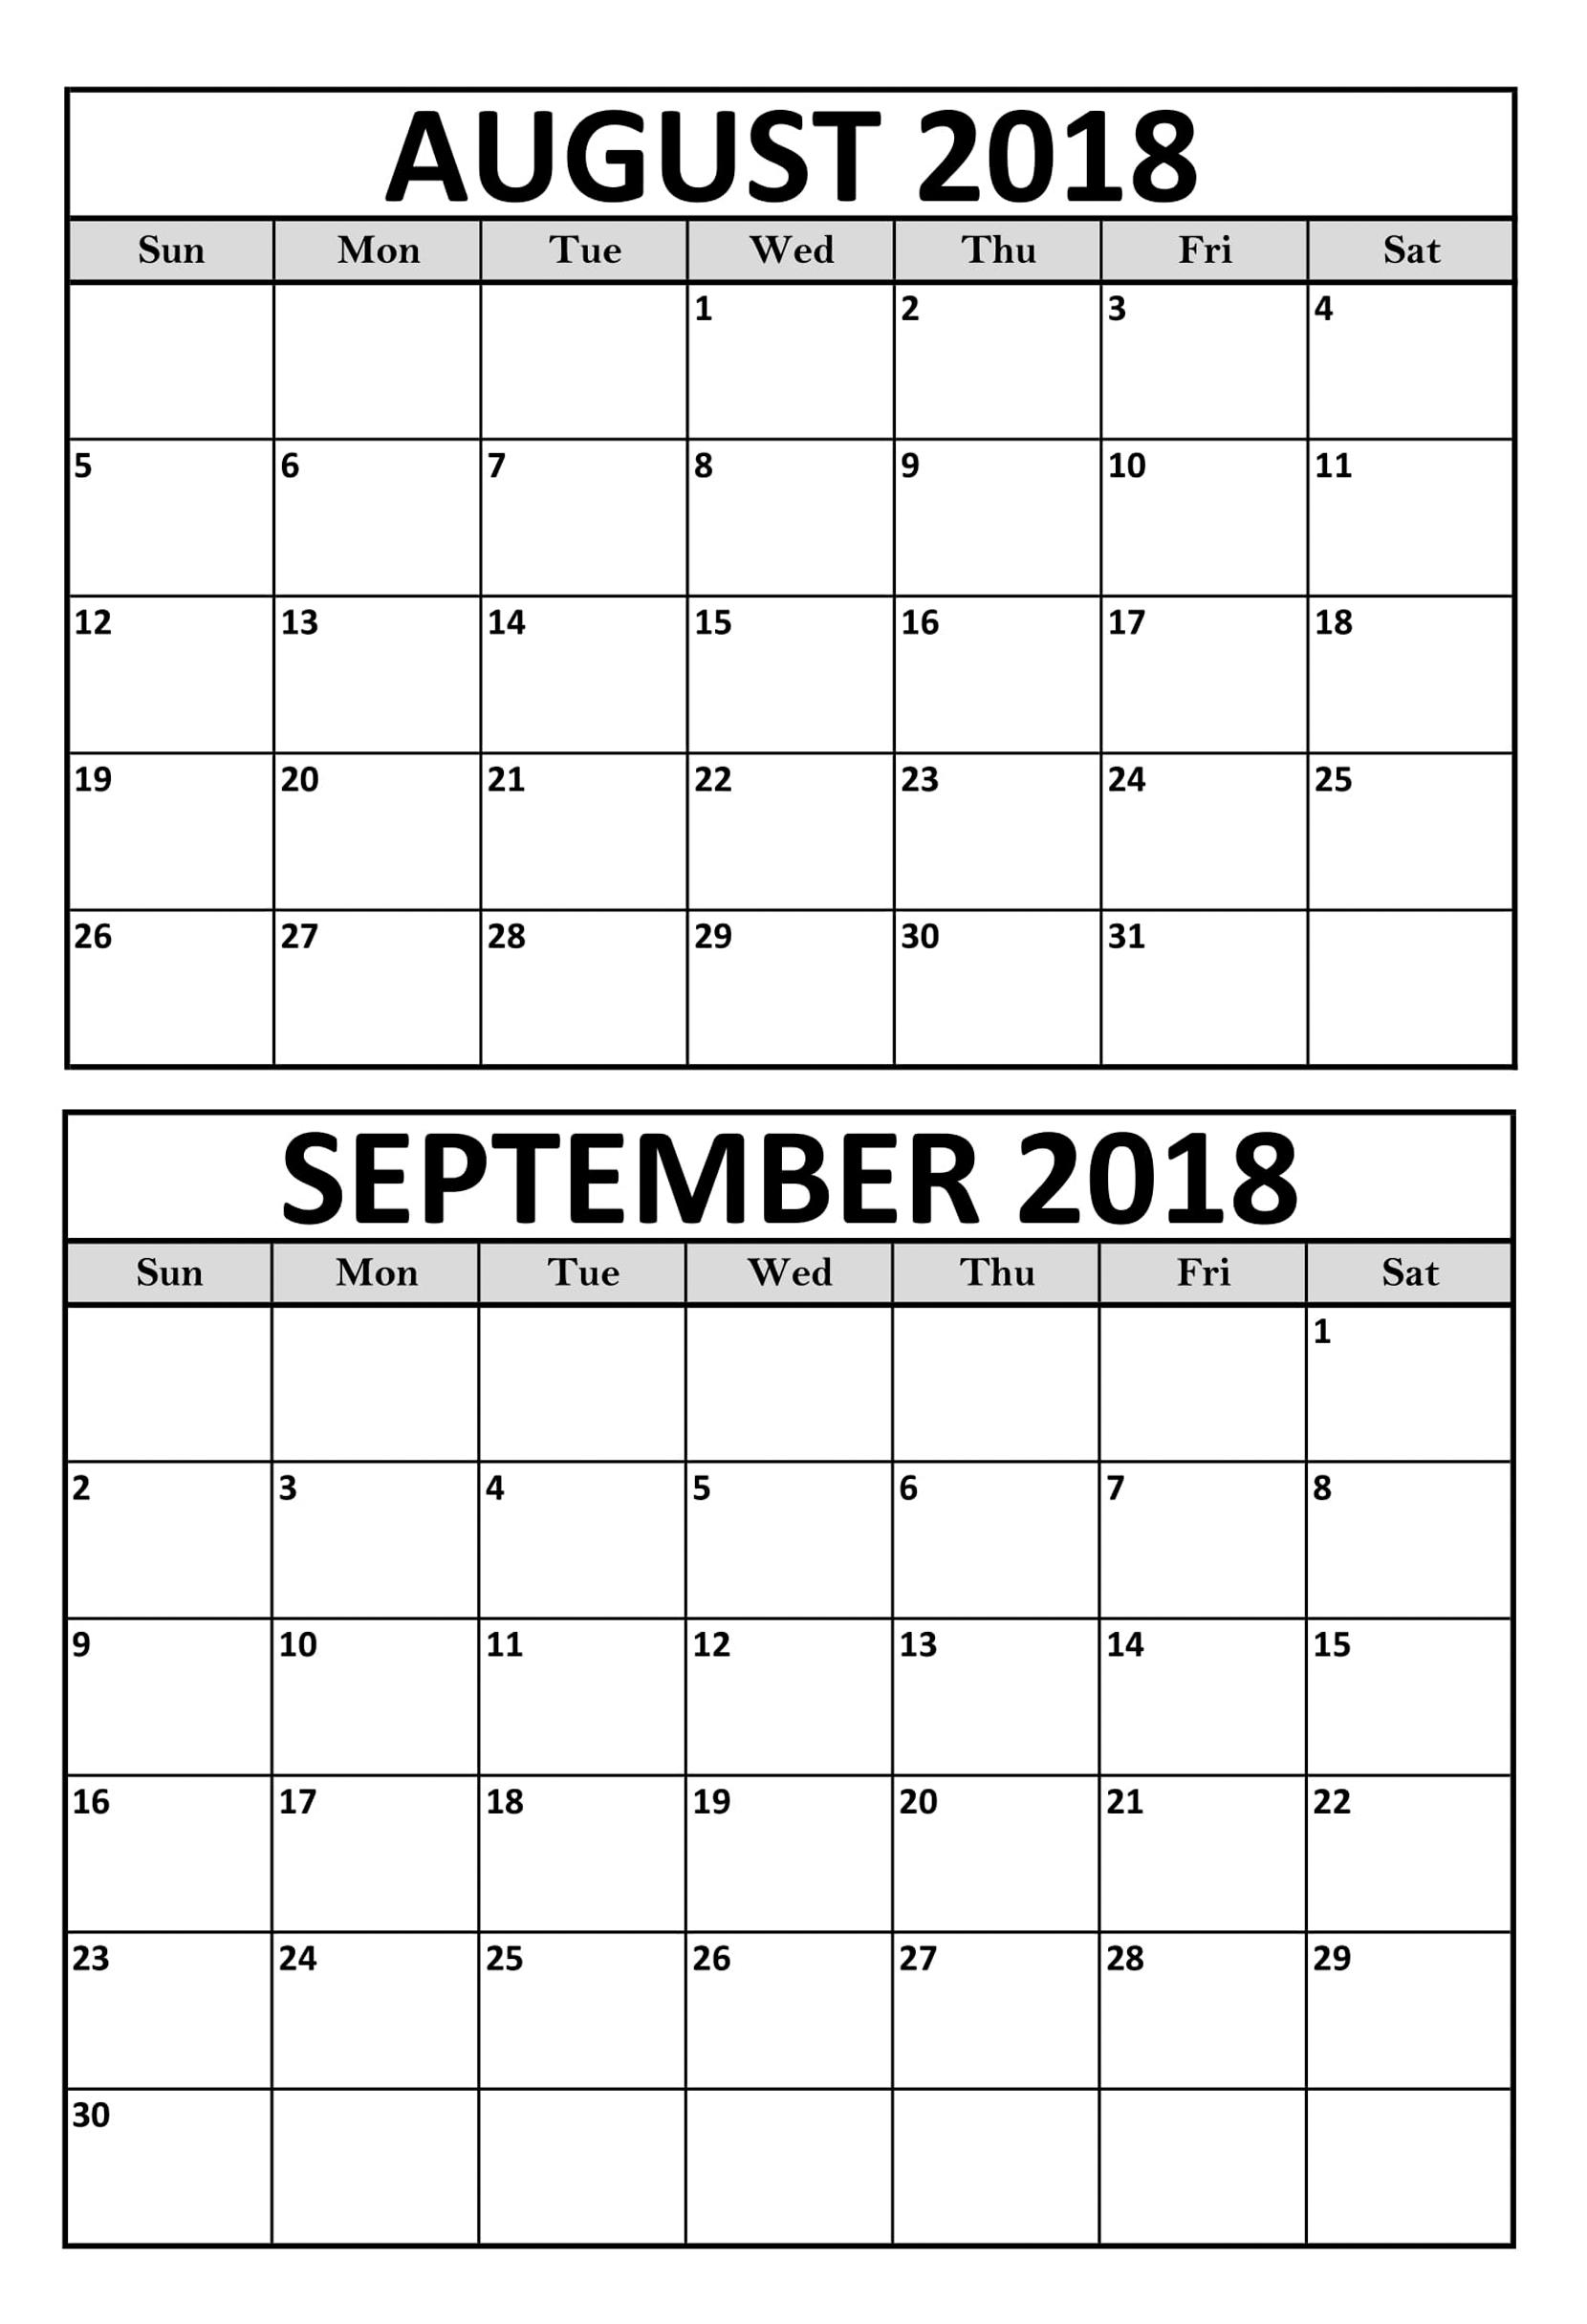 August September 2018 Calendar Printable Template | August September pertaining to August And September Calendar Template